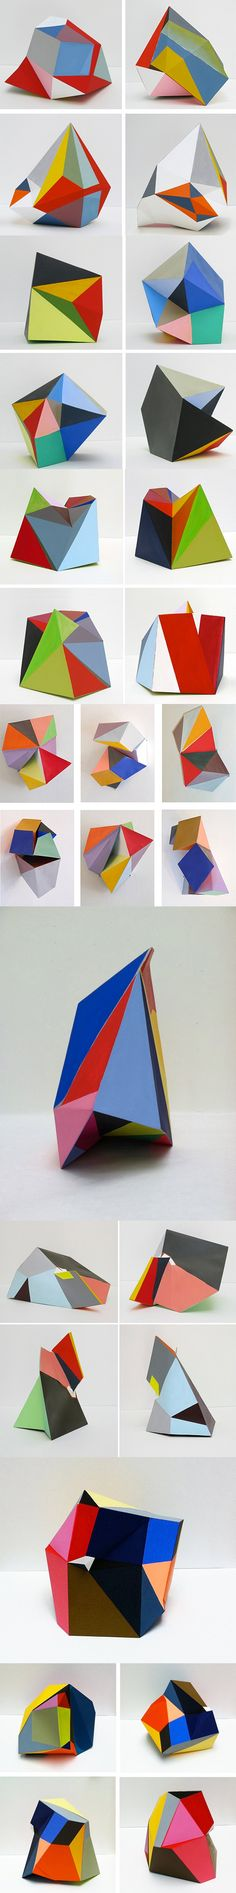 Paper sculptures by Lisa Hamilton.    via BOOOOOOOOM  www.booooooom.com/2011/10/14/paper-sculptures-by-artist-lisa-hamilton/